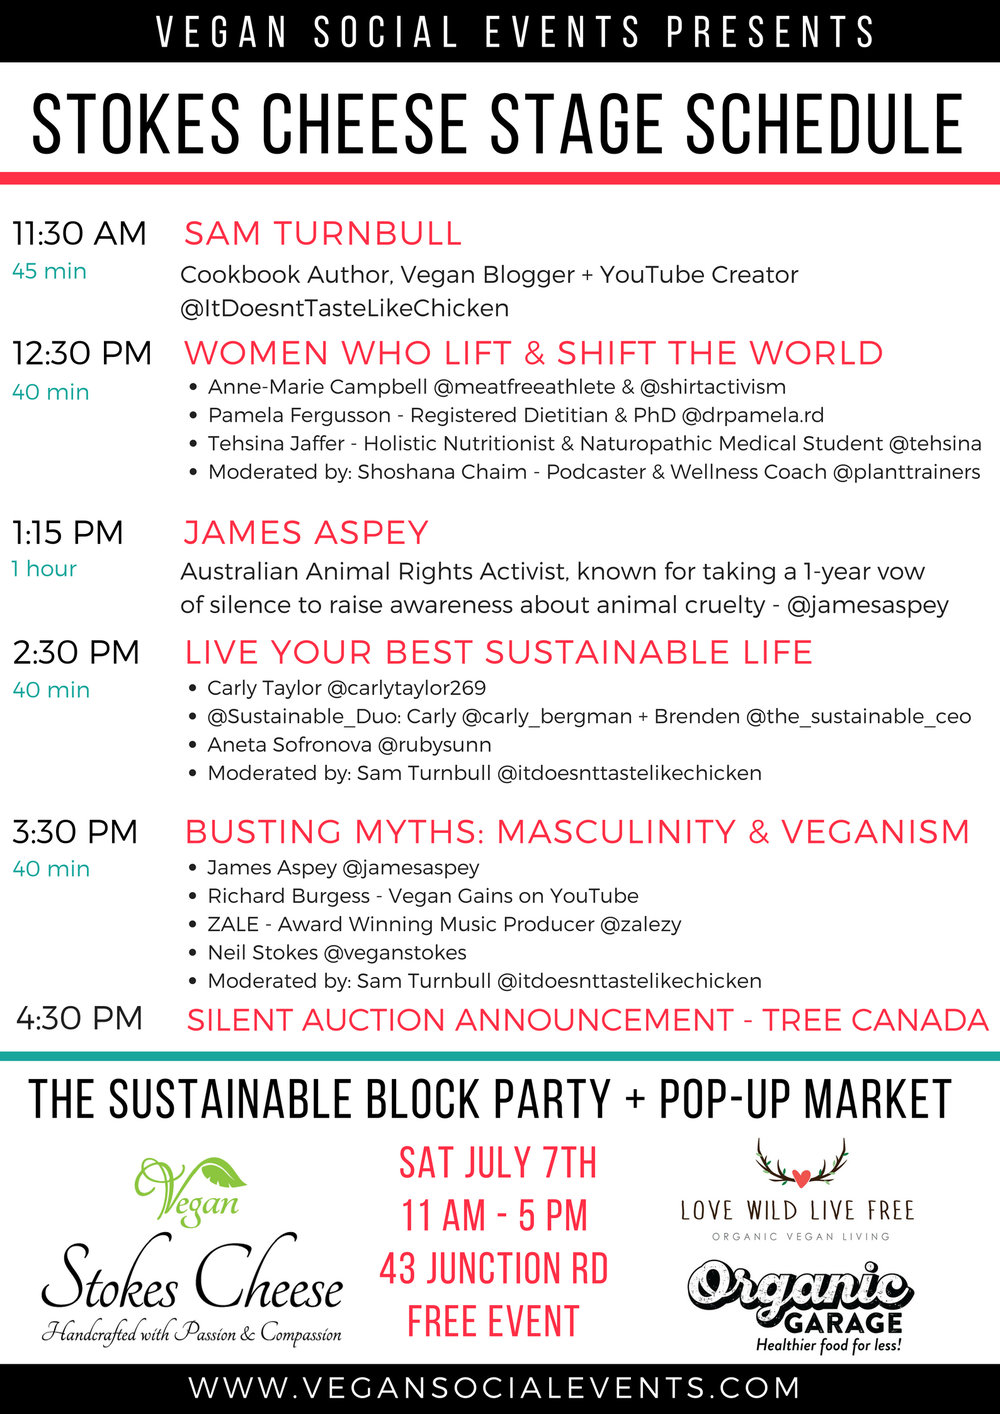 Schedule-July7-VeganSocialEvents.jpg